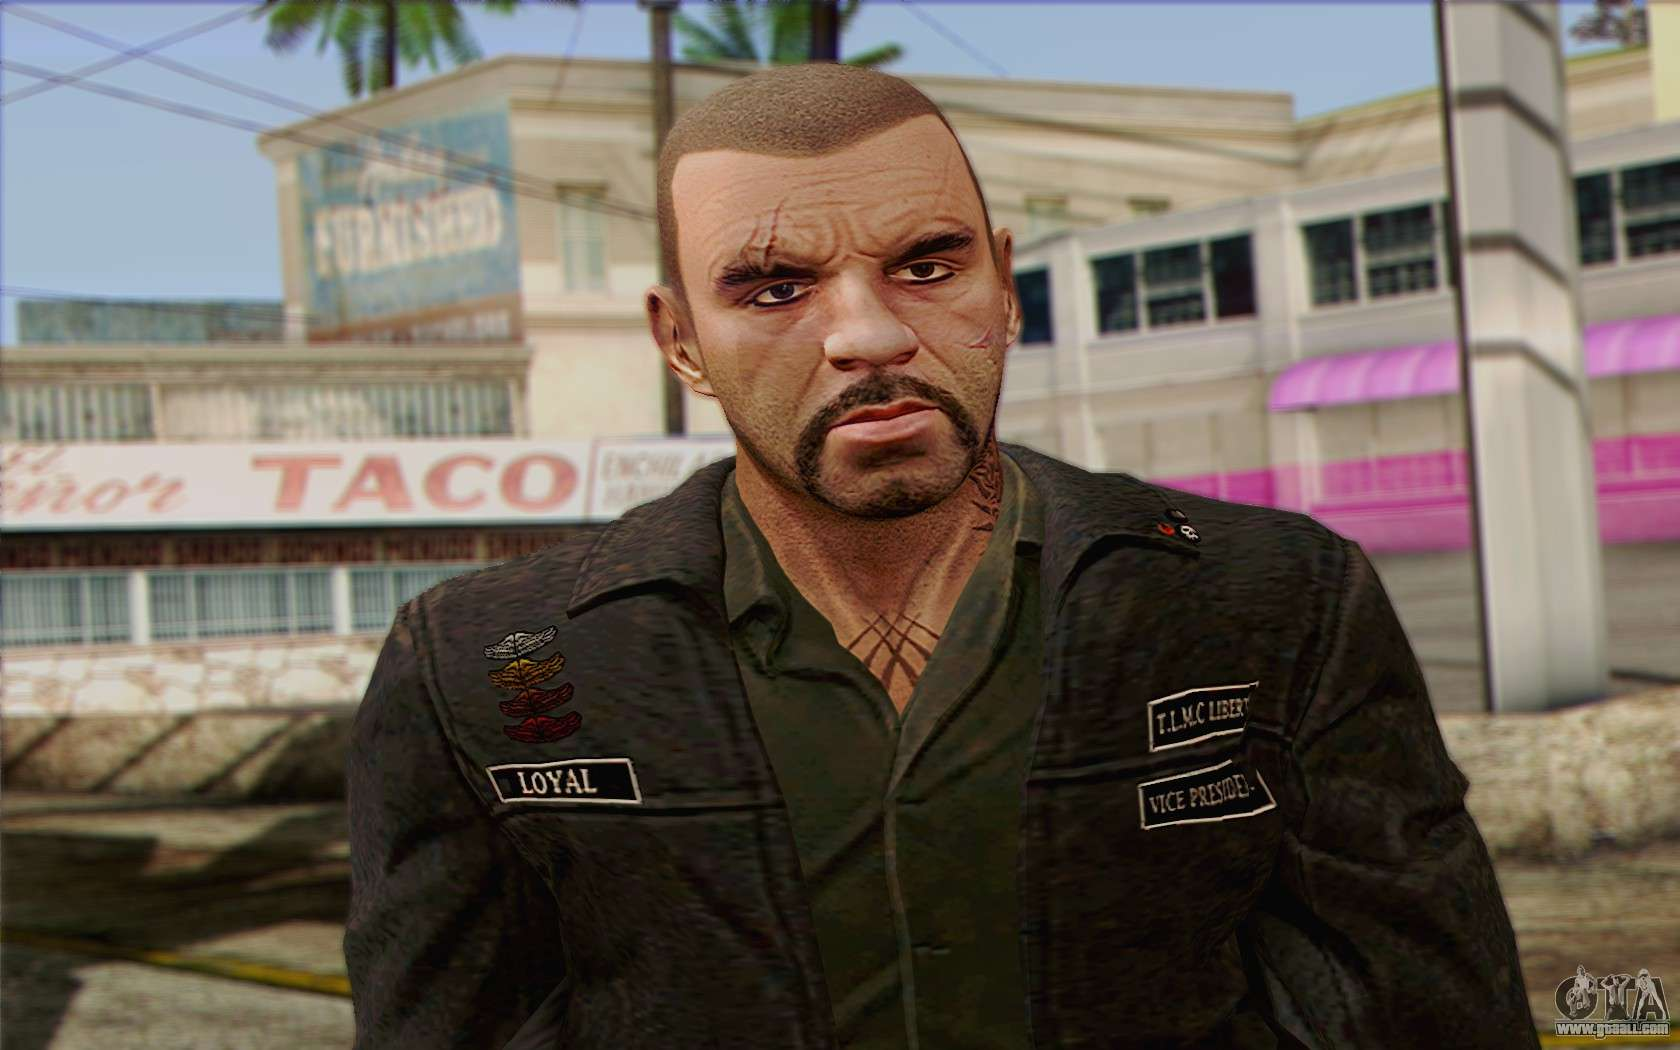 Johnny Klebitz From GTA V (With normal head) for GTA San Andreas